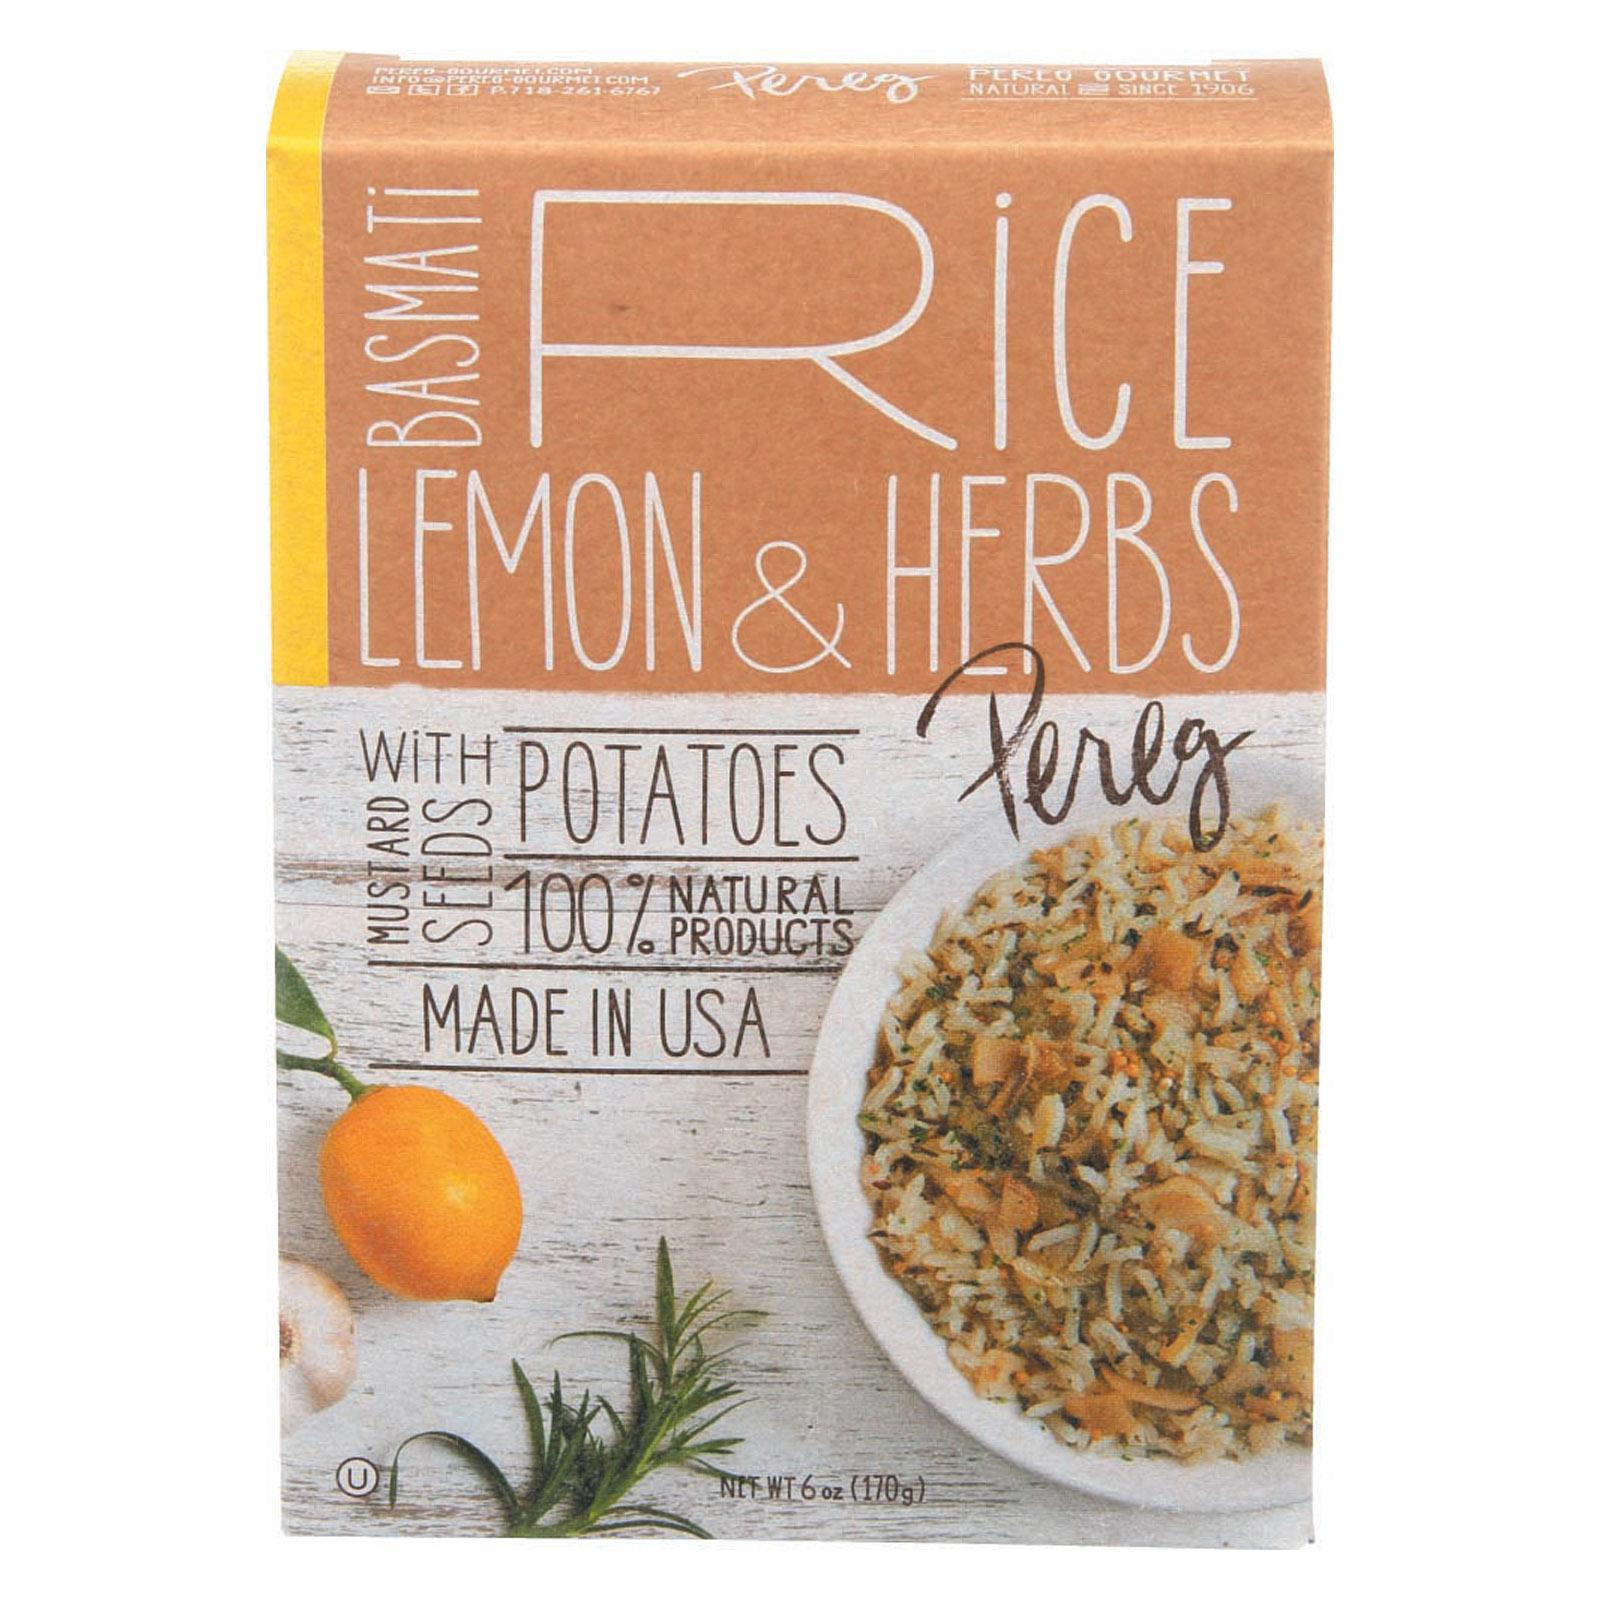 Pereg Basmati - Rice - Lemon Herb - Box - Case of 6 - 6 oz